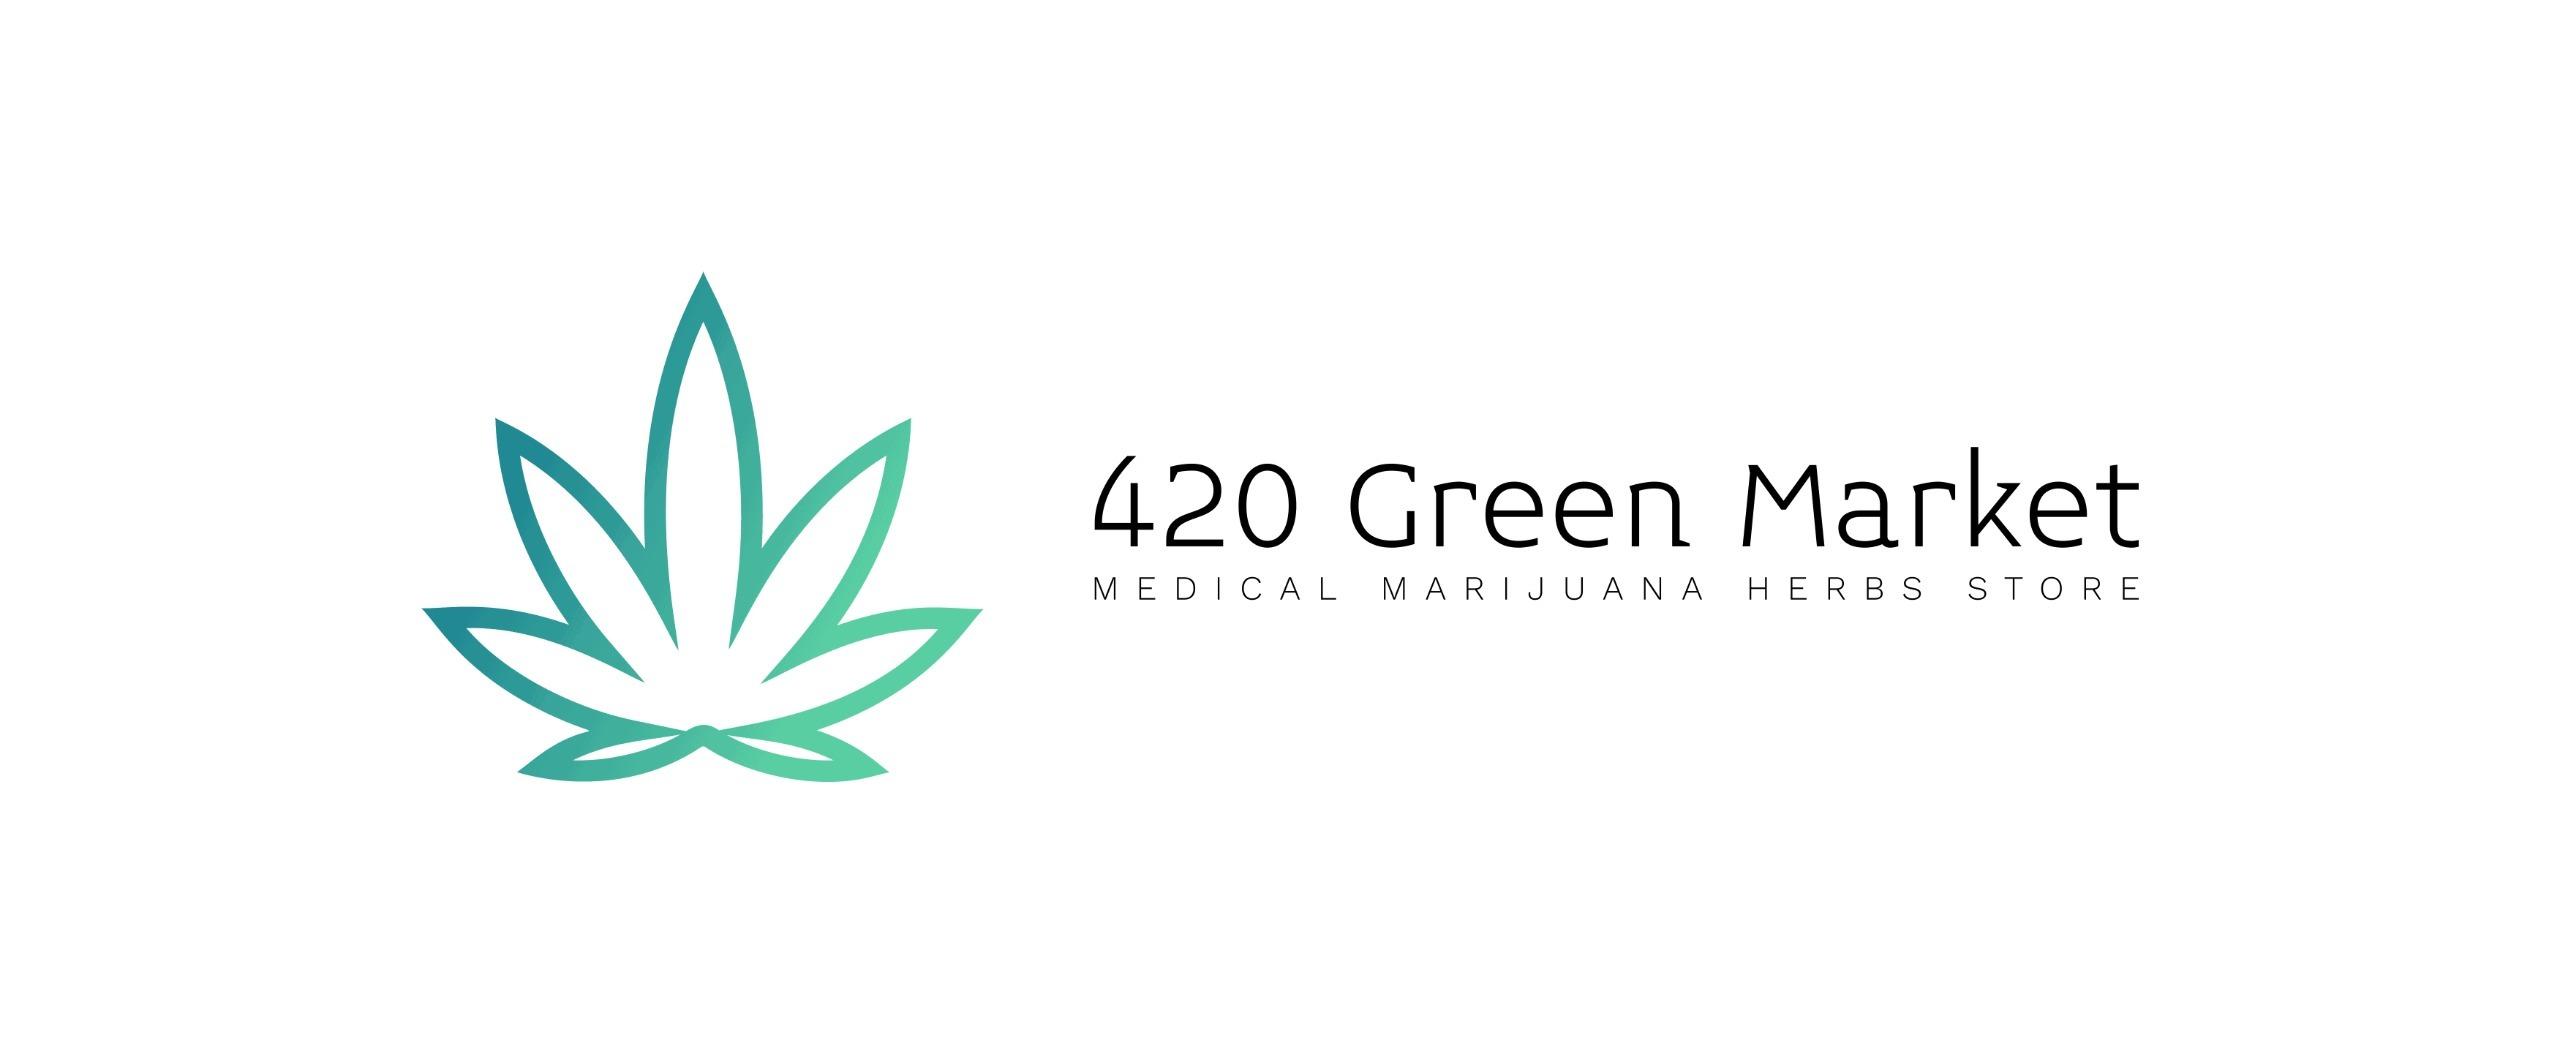 420 Green Markett (@420greenmarket) Cover Image